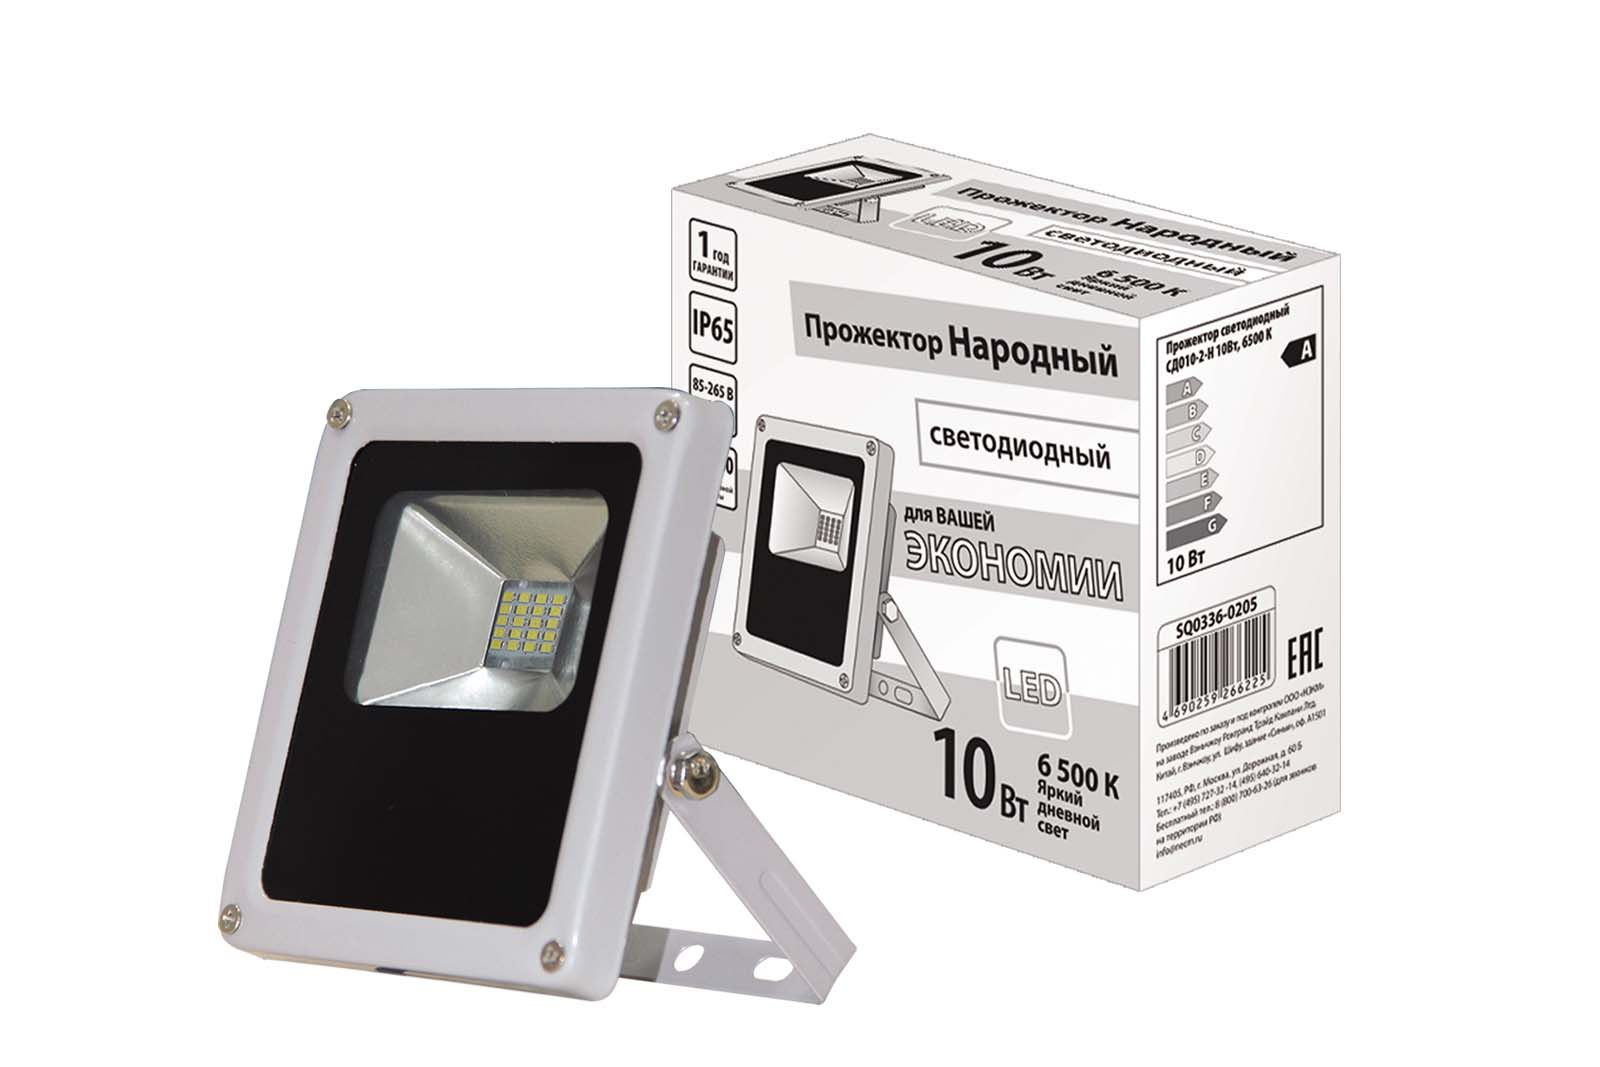 Прожектор ТДМ Sq0336-0205